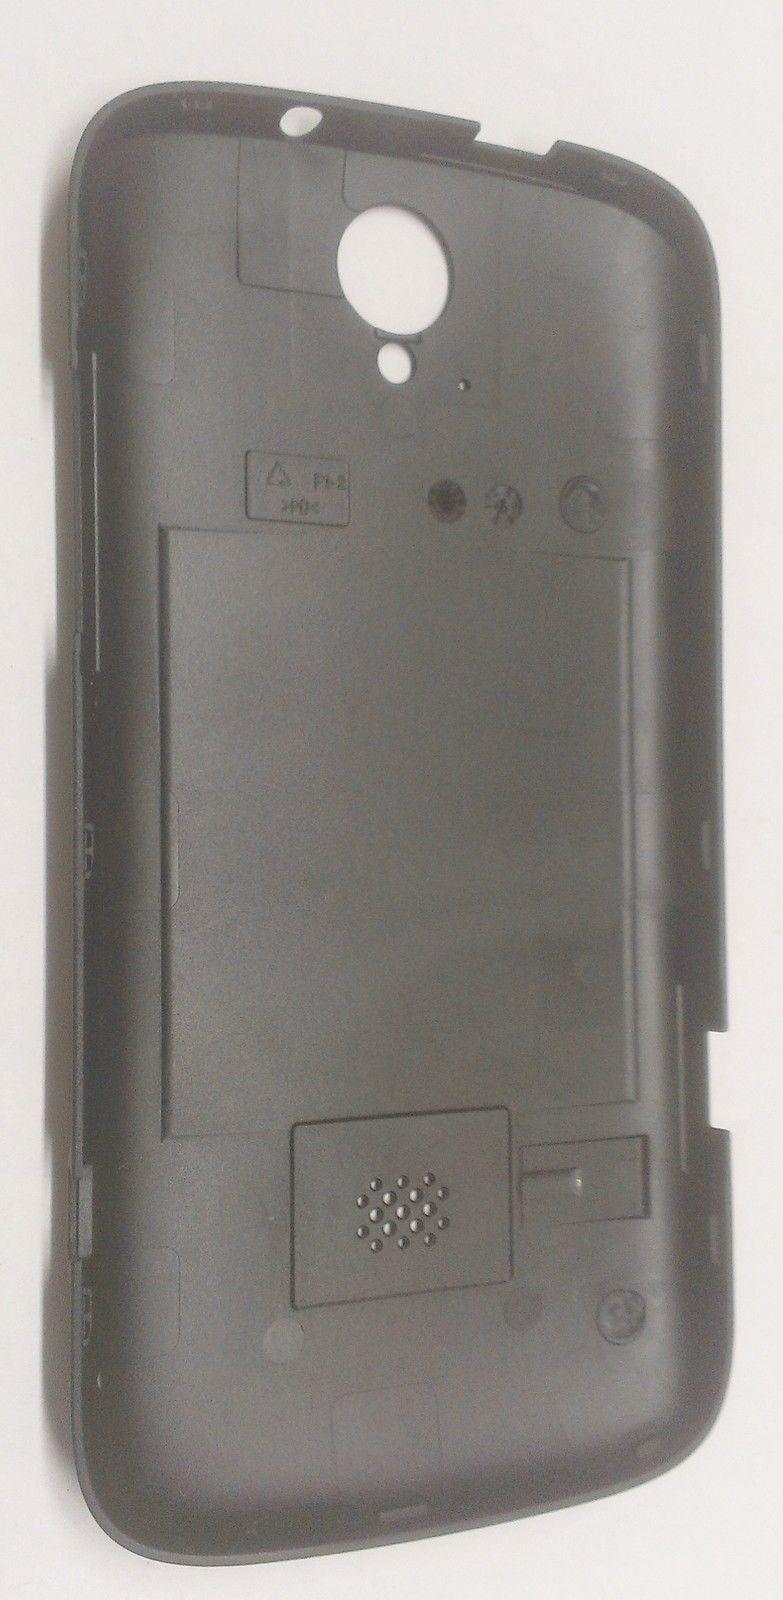 OEM Original Huawei myTouch Q  Back Cover Battery Door T-Mobile U8730 - Black image 2